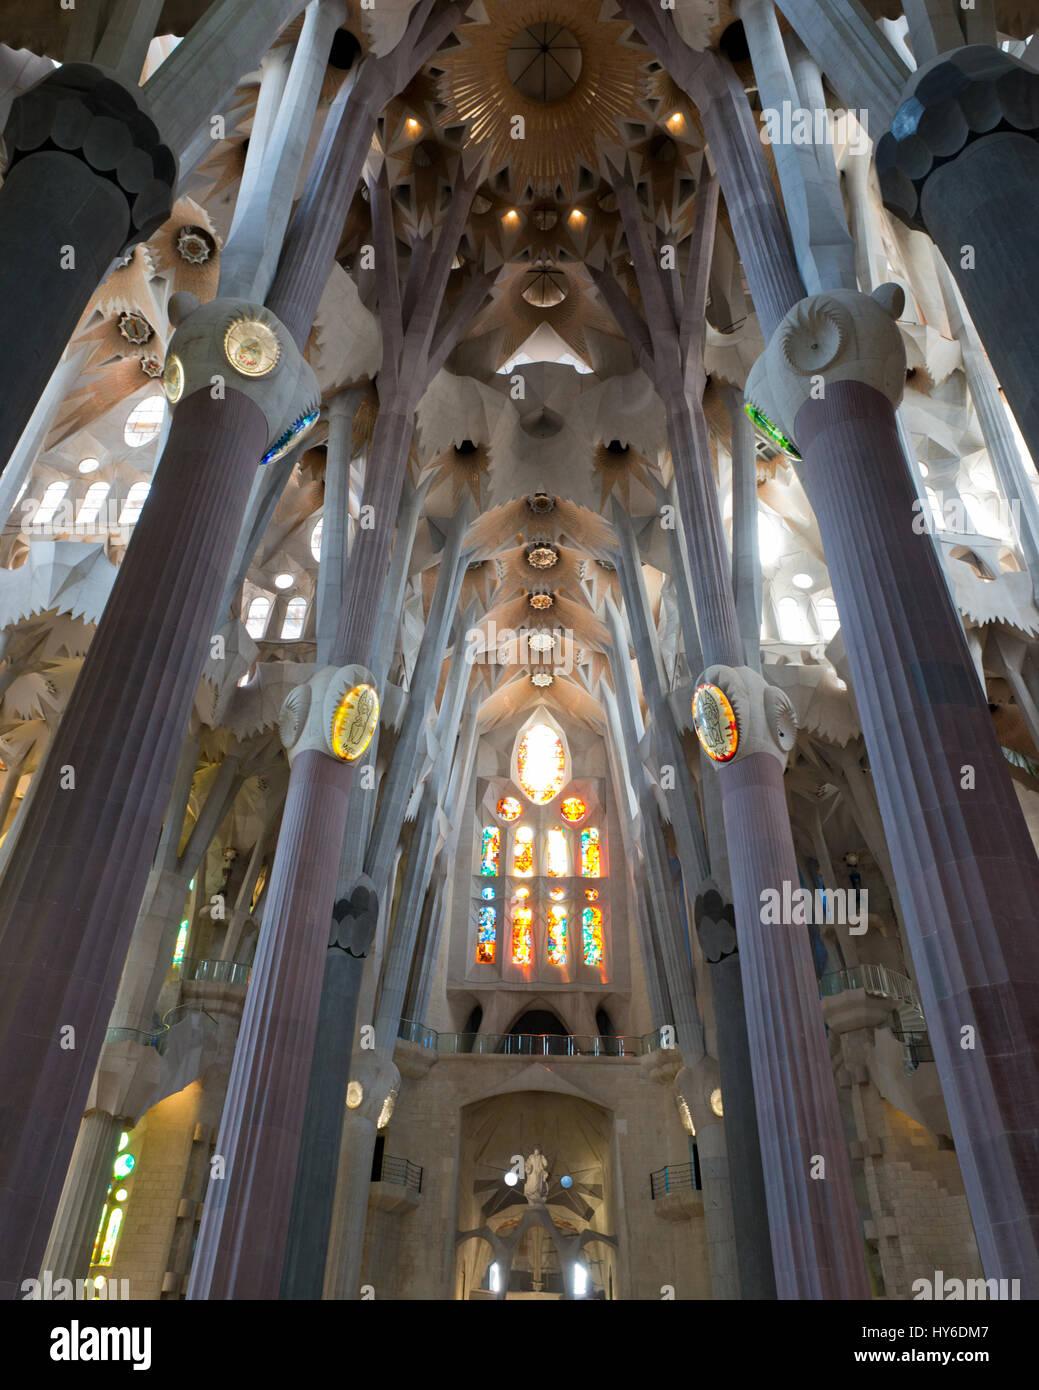 Interior nave of Sagrada Família Basilica by Antoni Gaudí, UNESCO World Heritage site, Barcelona, Catalonia, - Stock Image